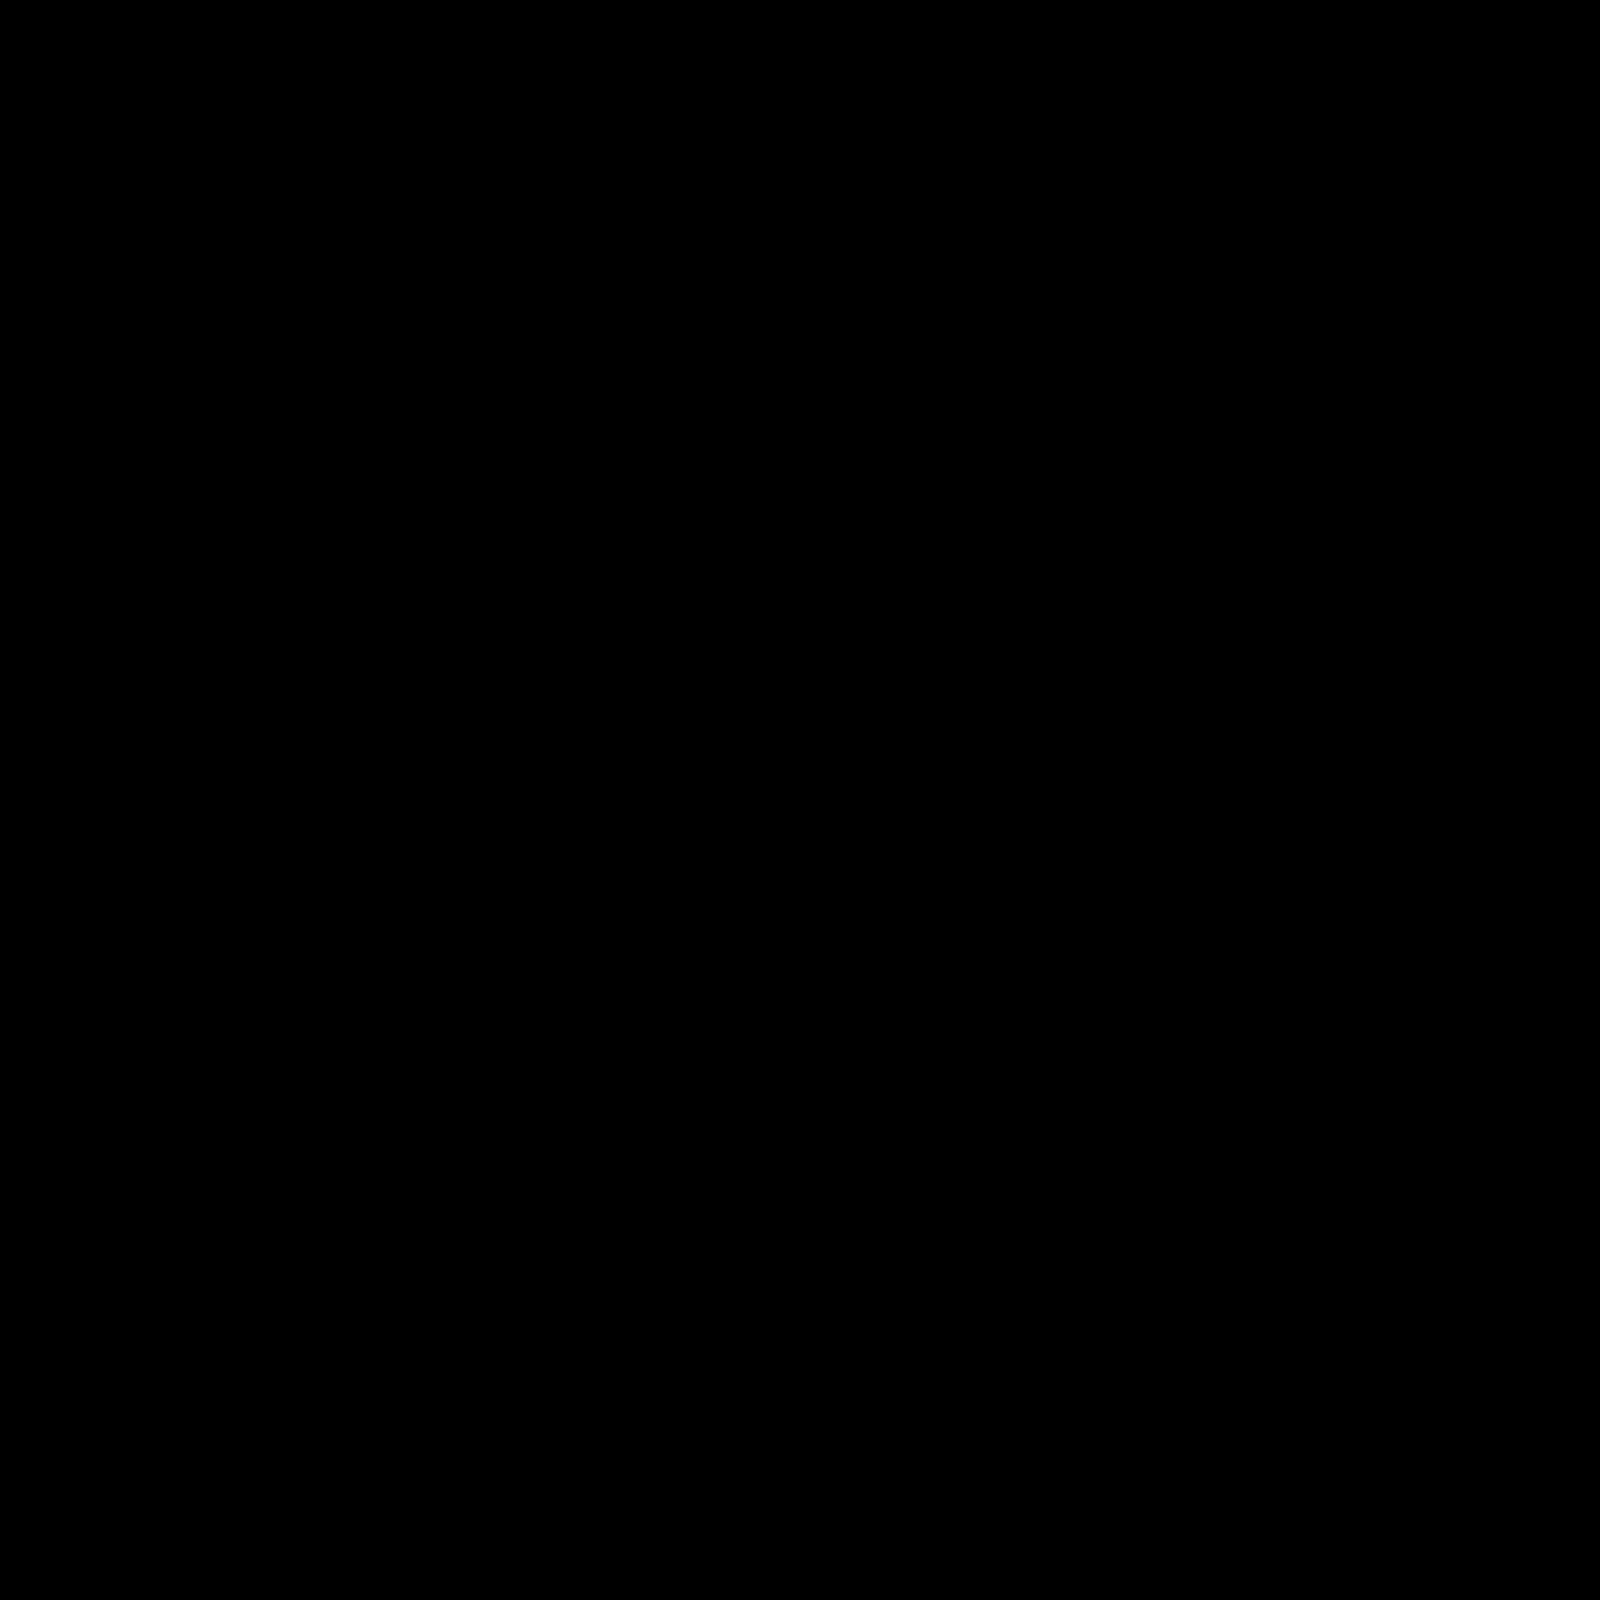 Wifi PNG - 173258